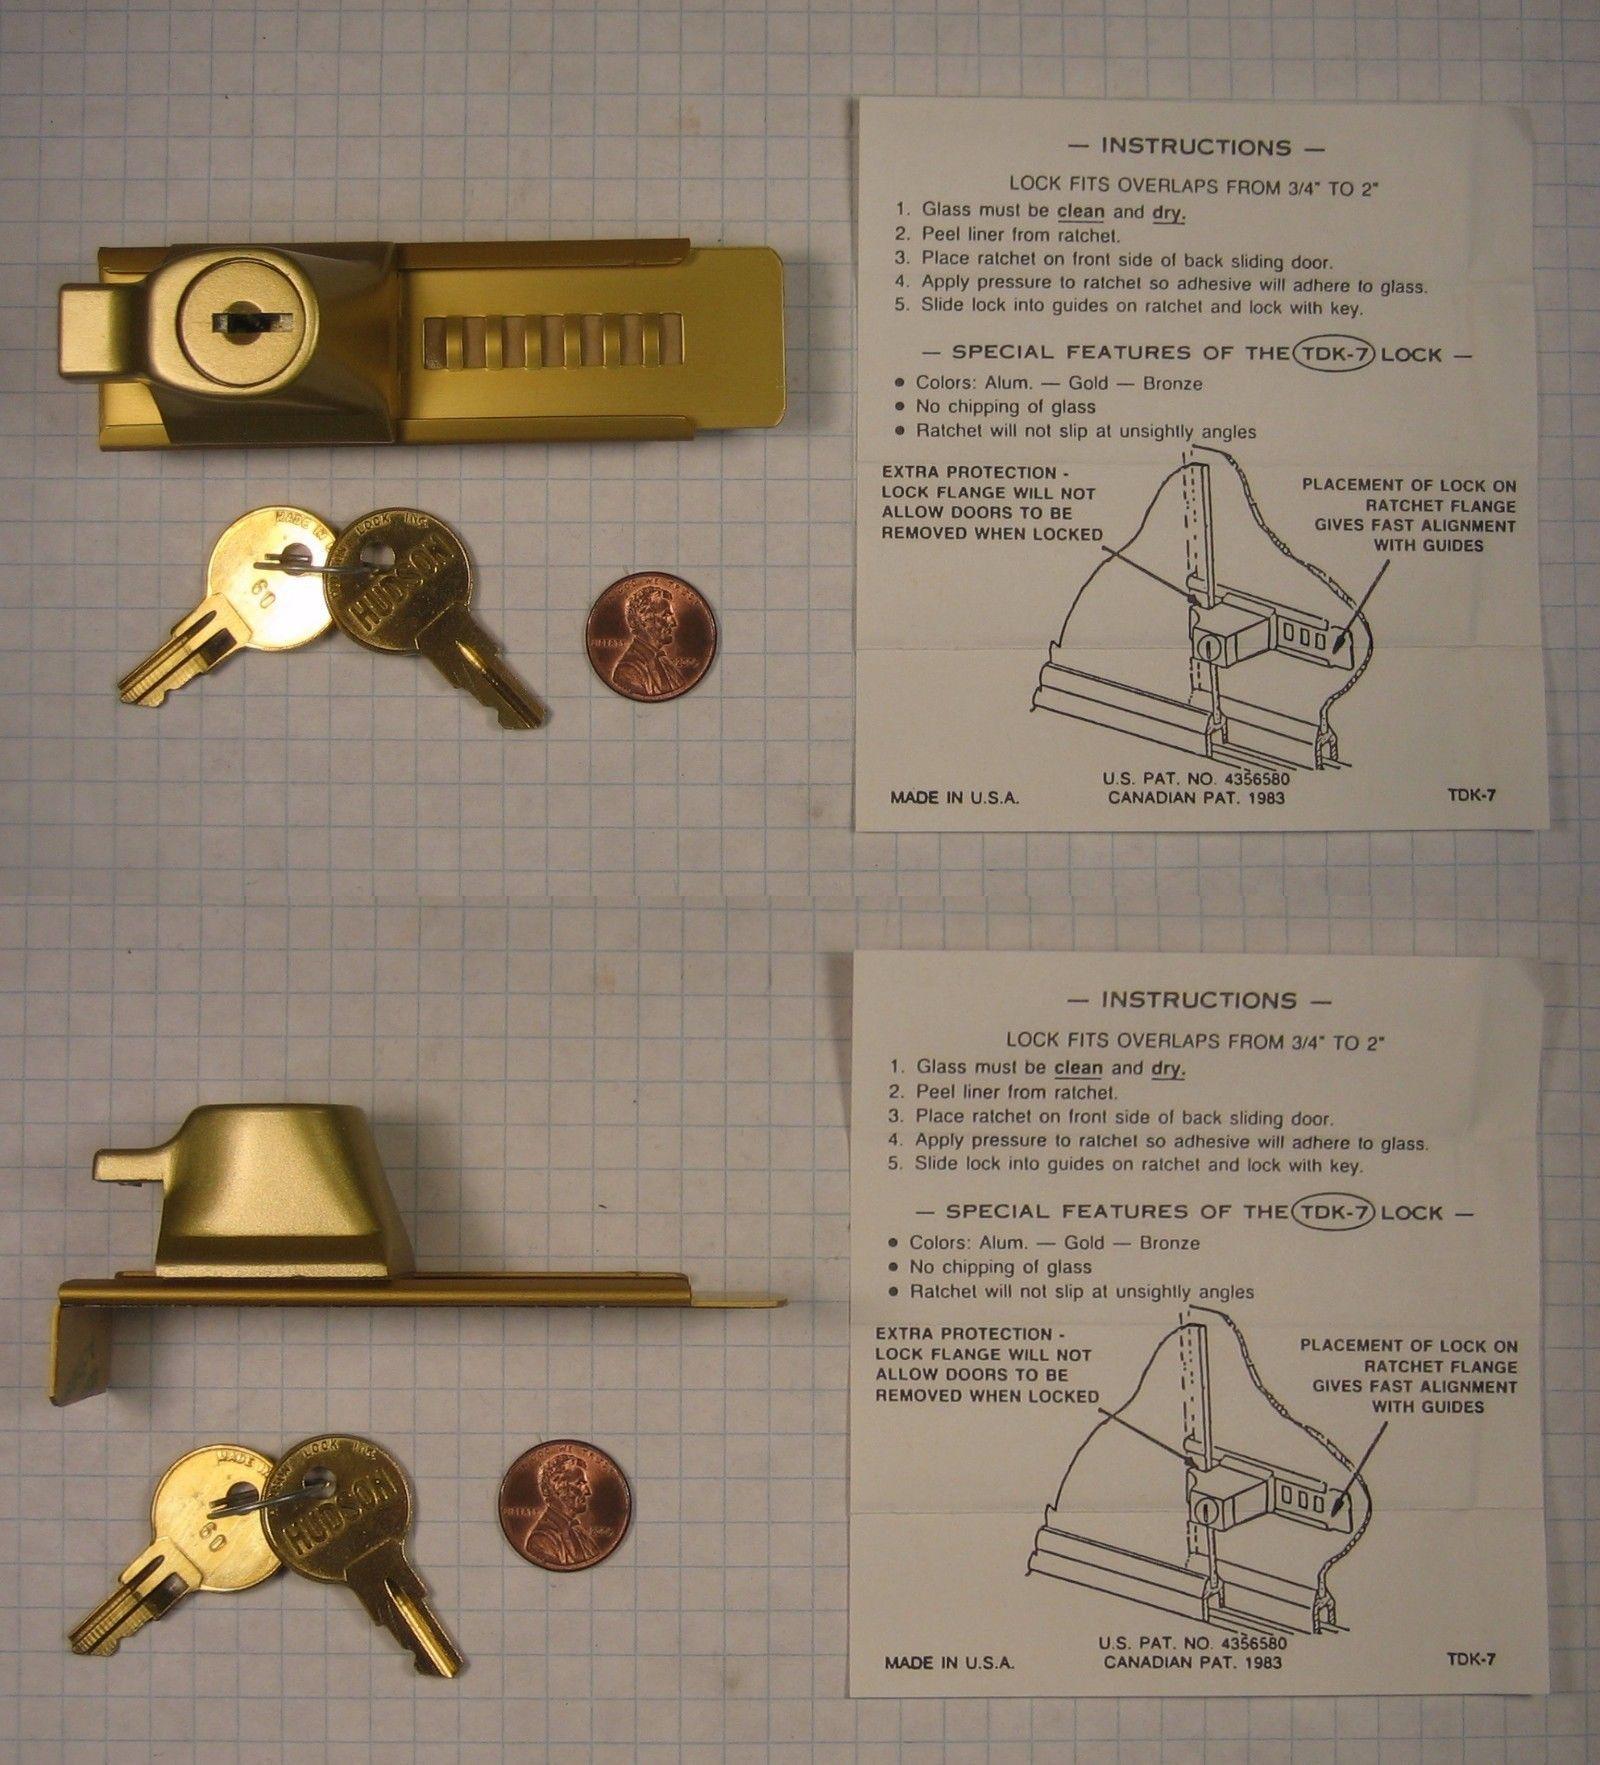 Cabinet And Drawer Locks 180961 Baker Tdk 7 Gold Key 60 Bi Passing